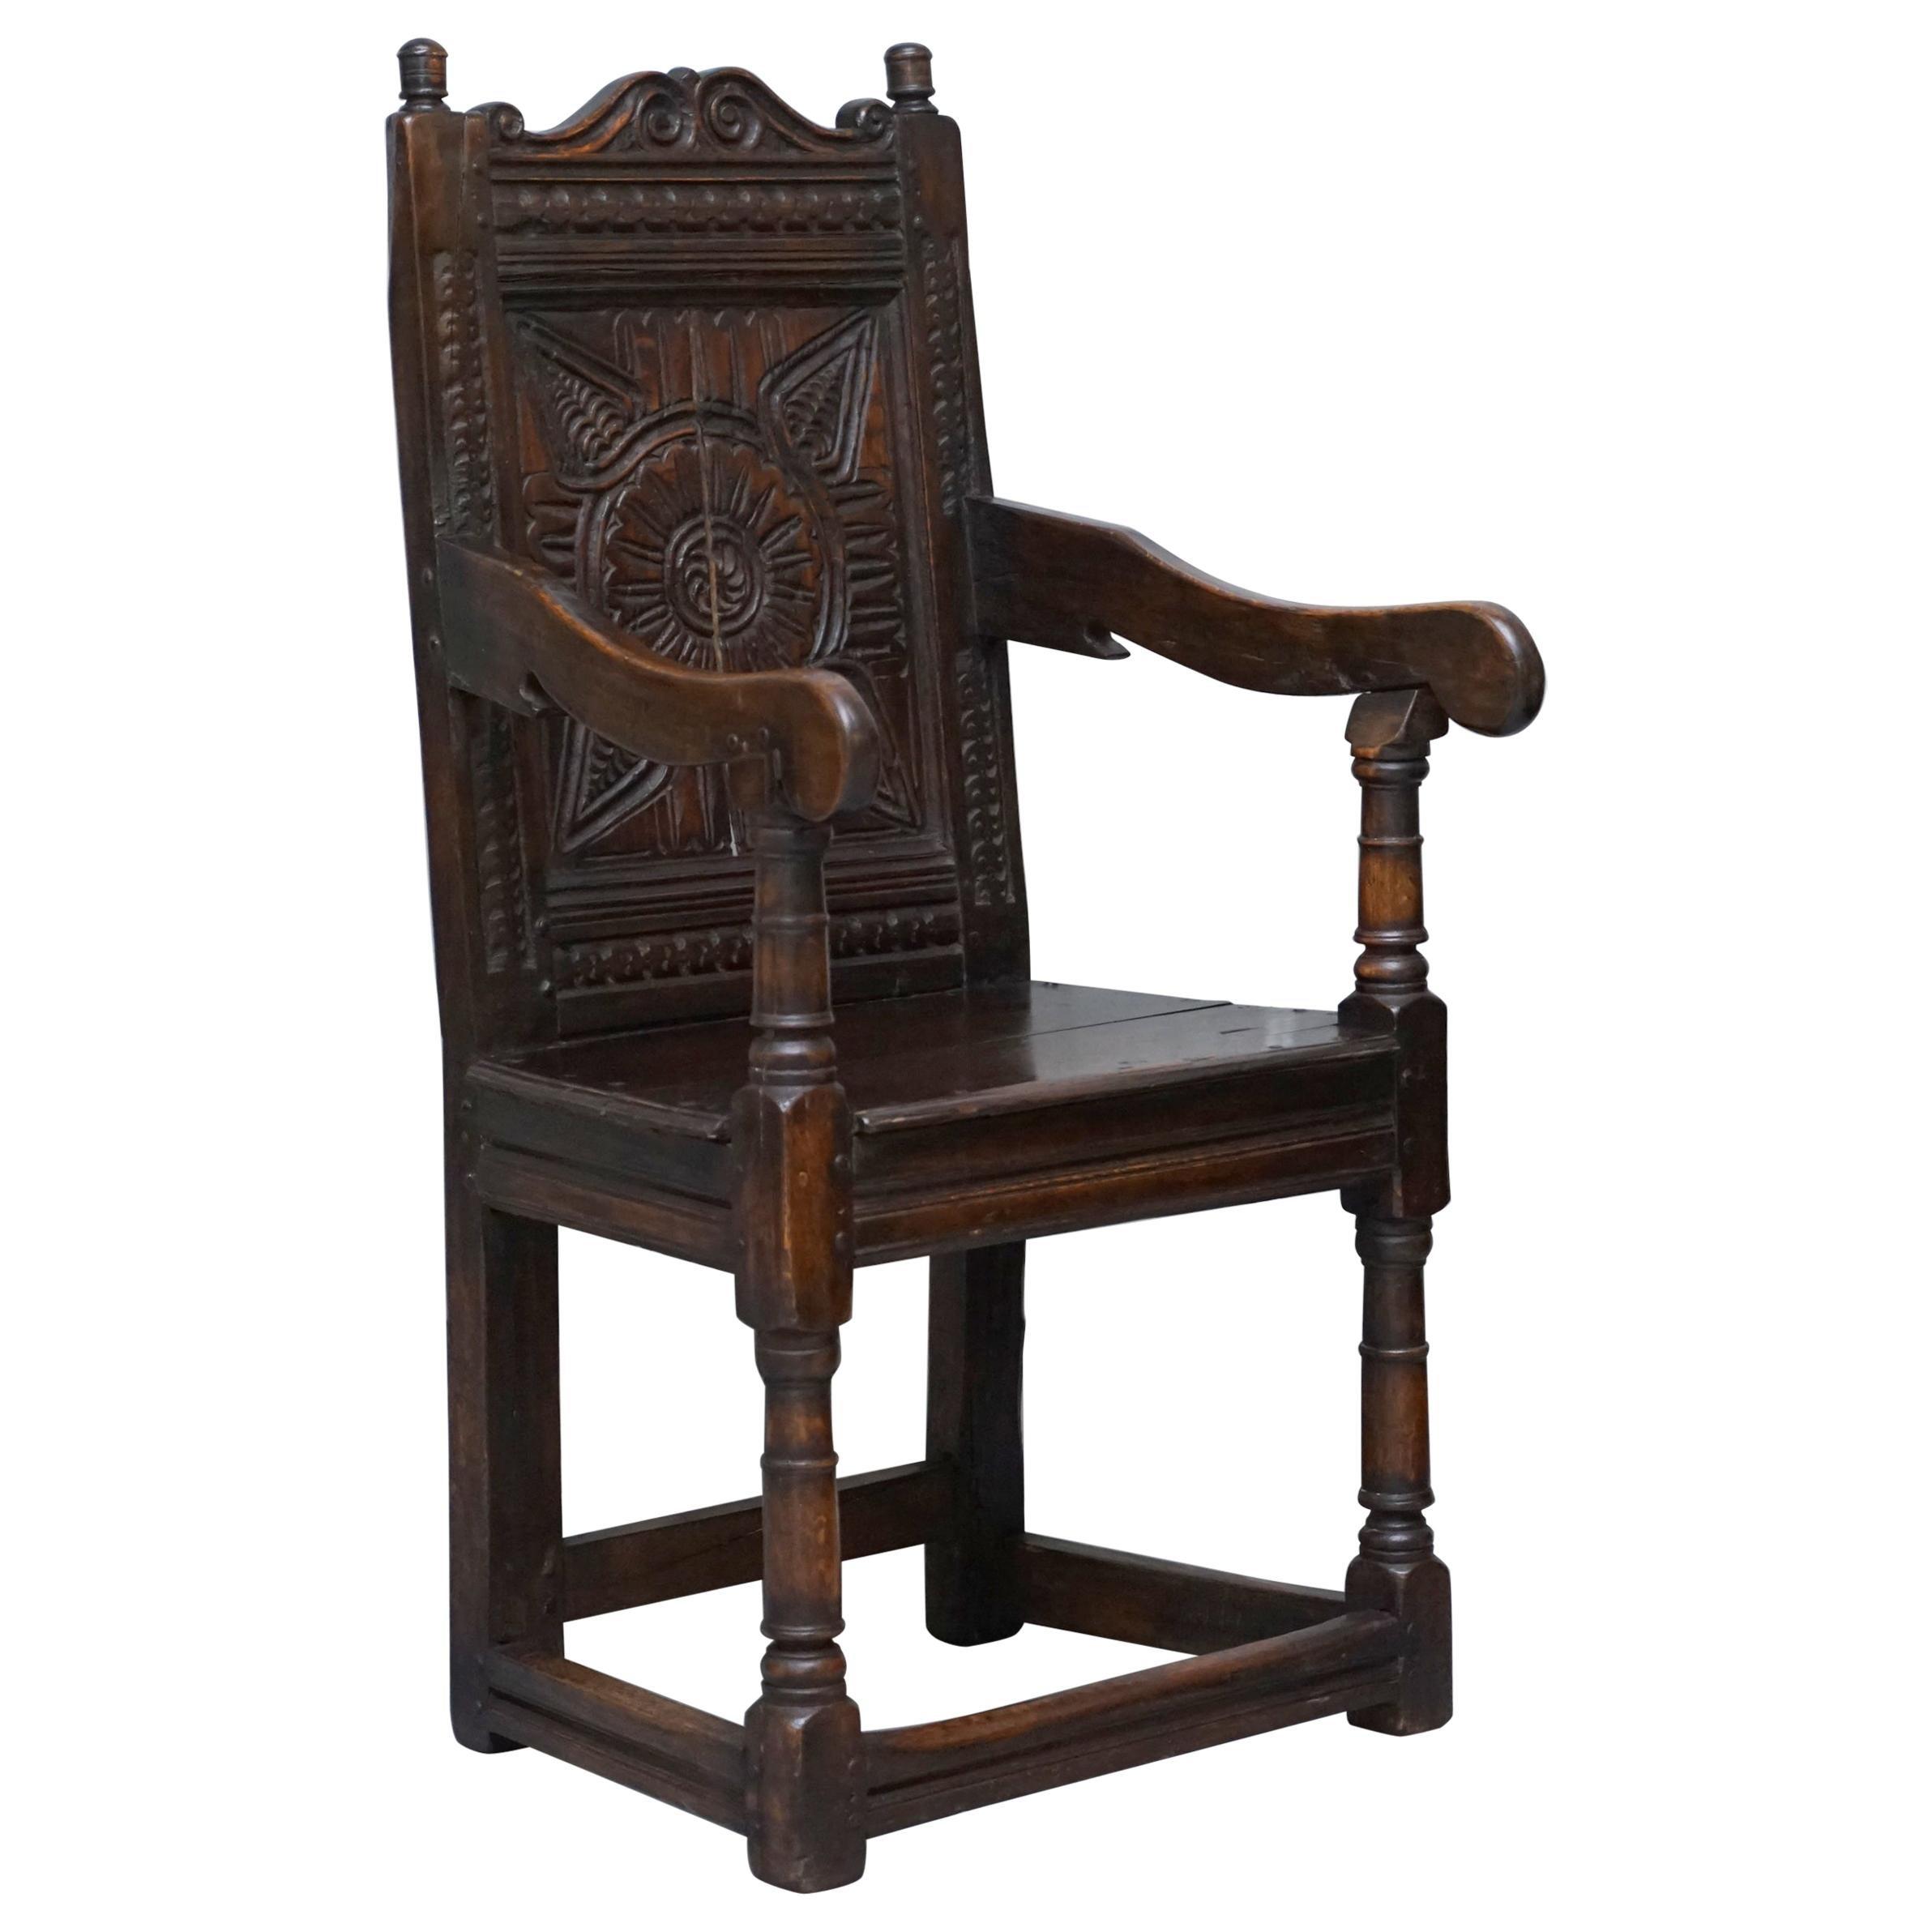 Exceptionally Rare Original 17th Century Wainscot Armchair Northern England Oak